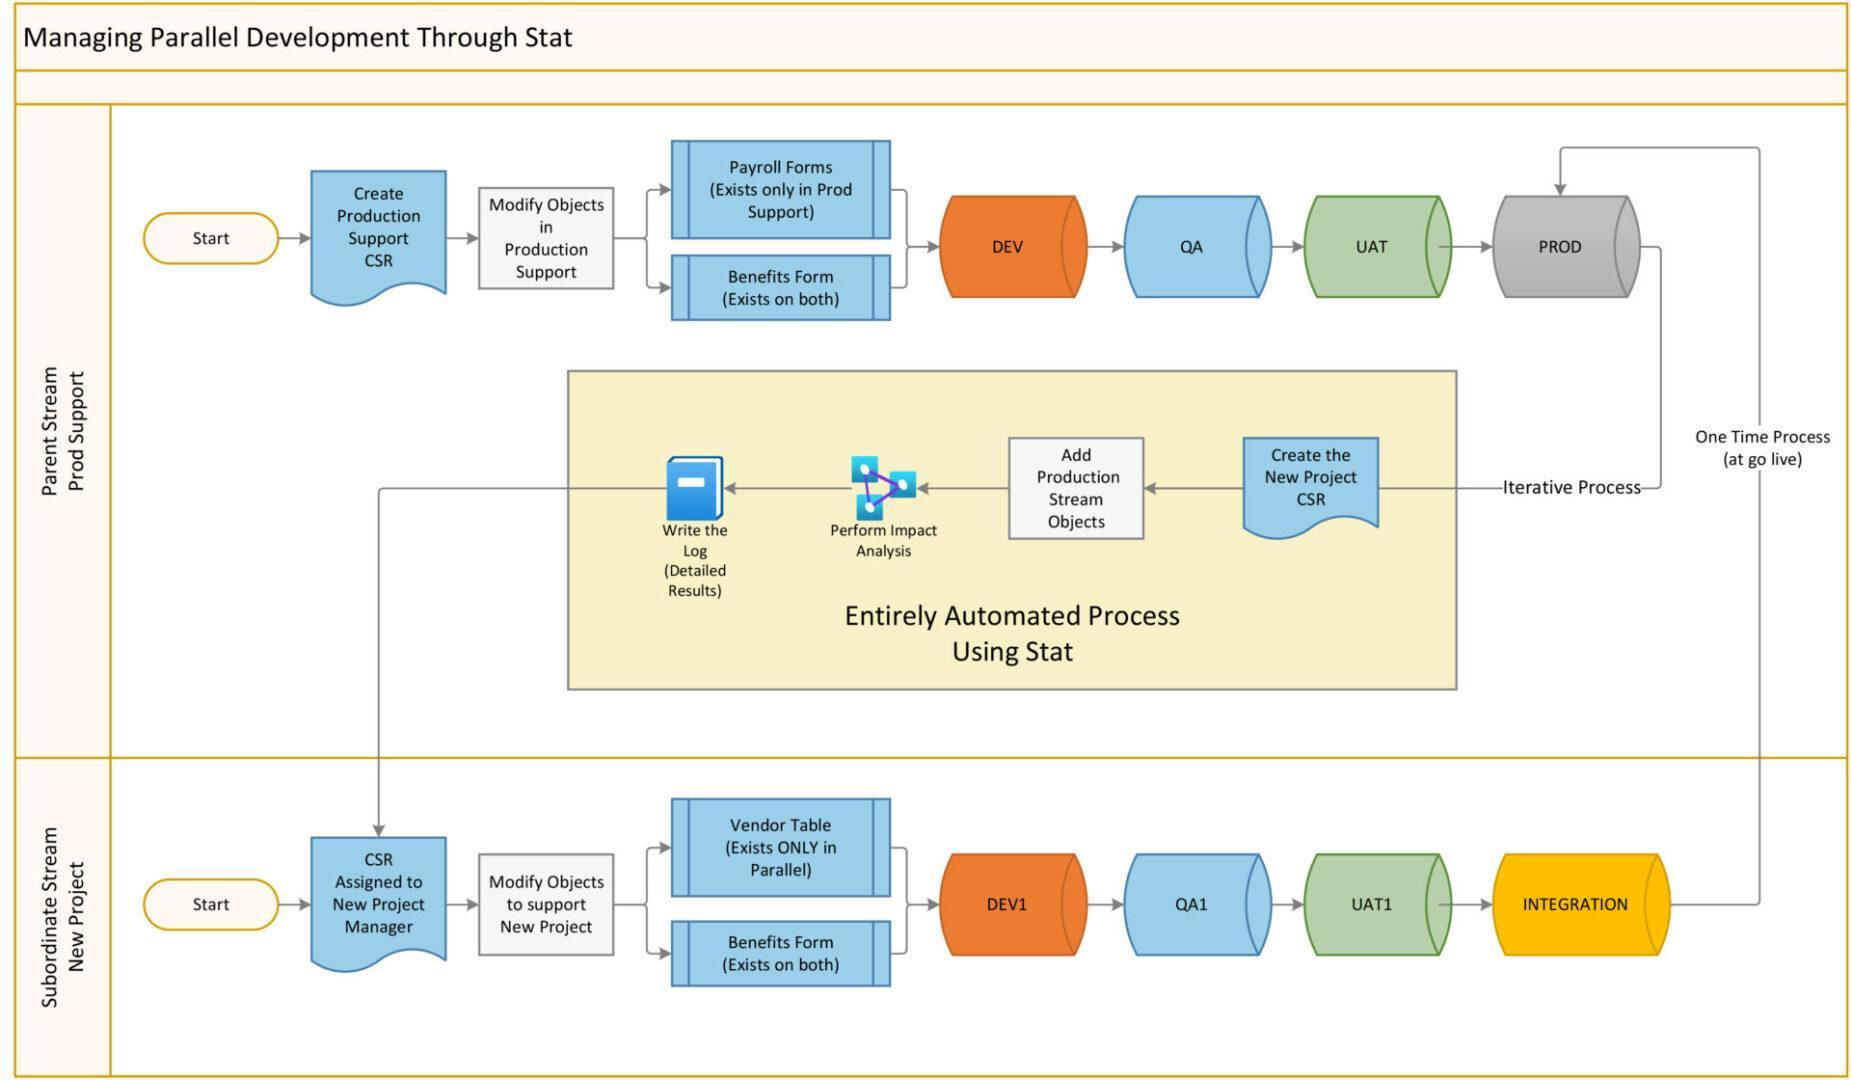 Visio-Managing Parallel Development Through Stat.vsdx